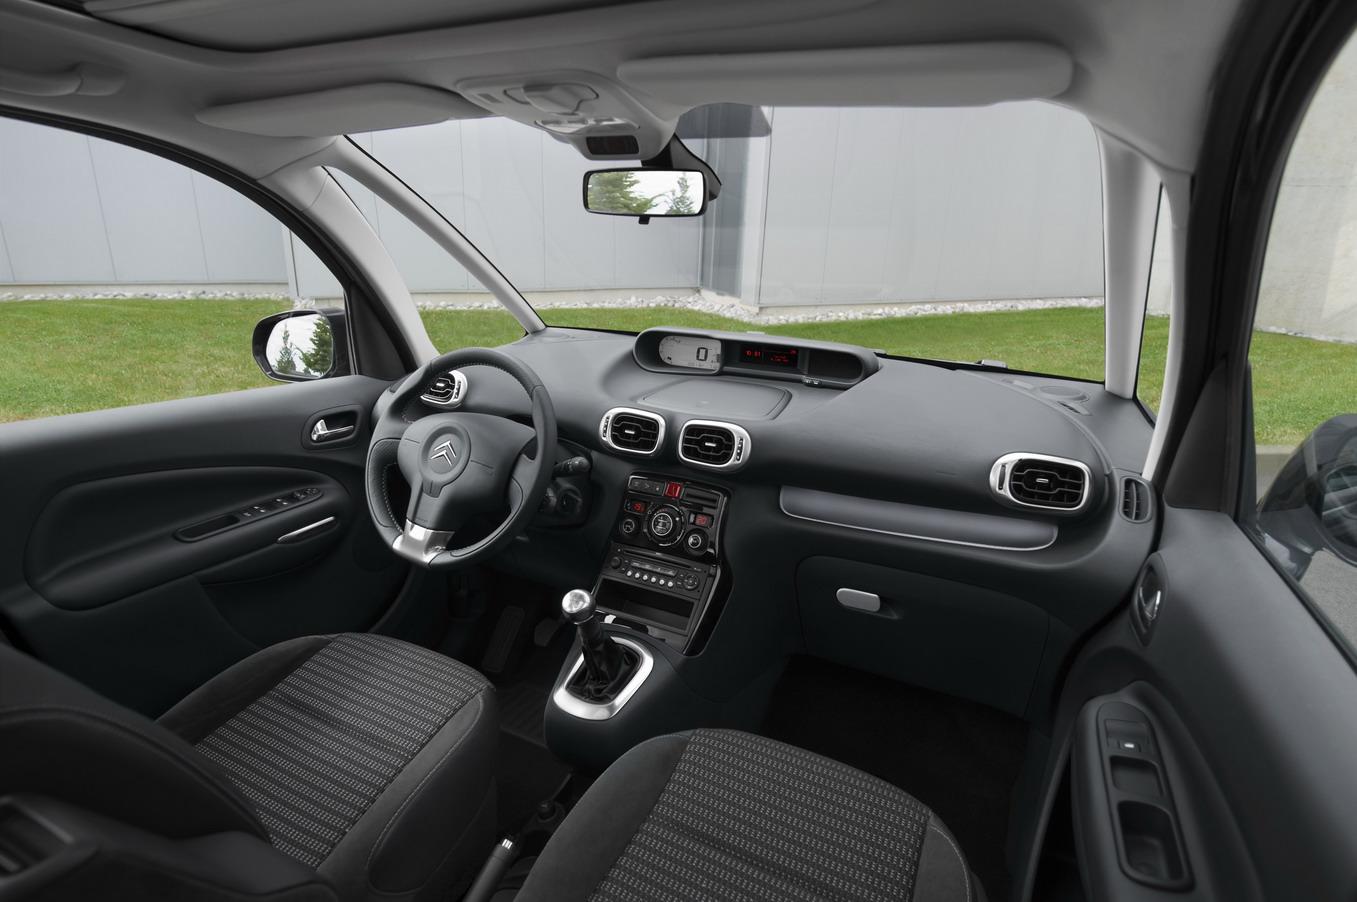 Citroen C3 Picasso I 2009 - 2012 Compact MPV #7